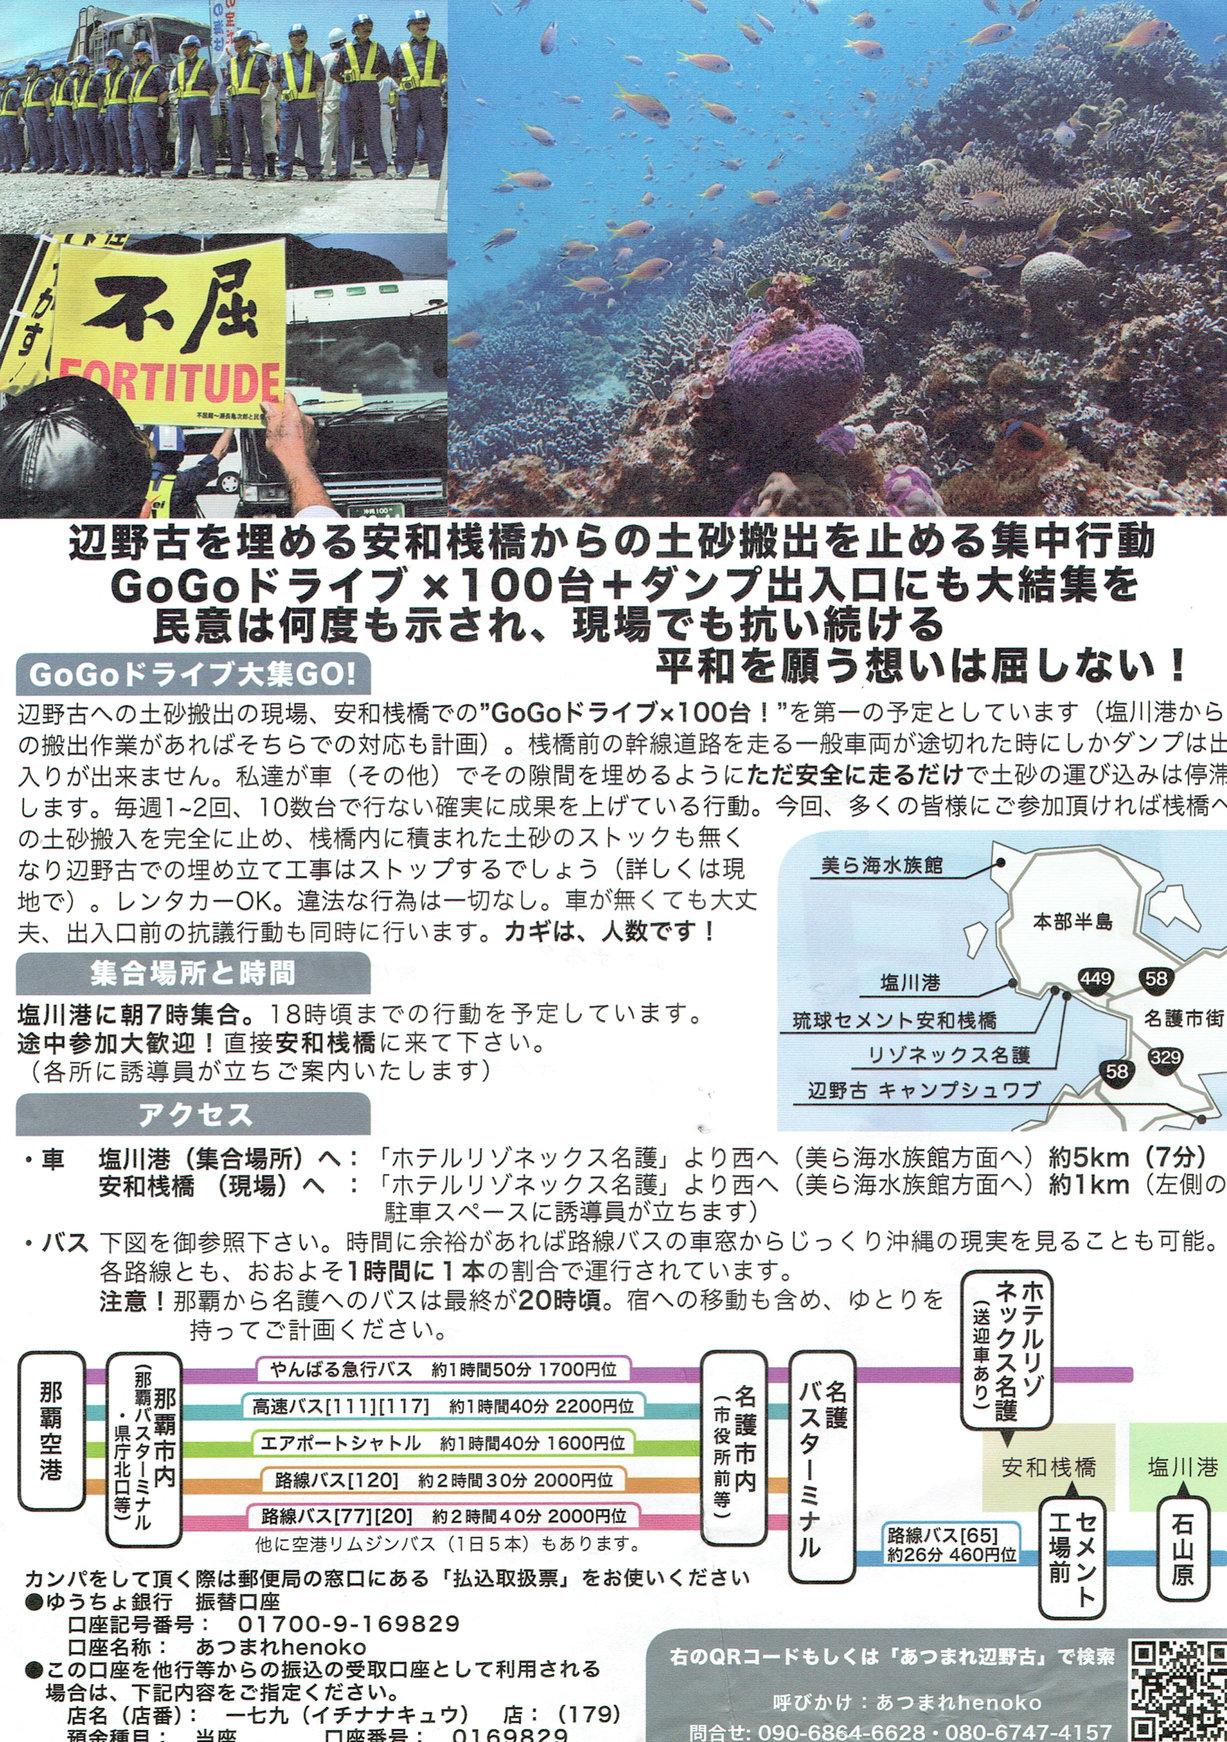 STOP-HENOKO 1021-25 連続5日大行動02